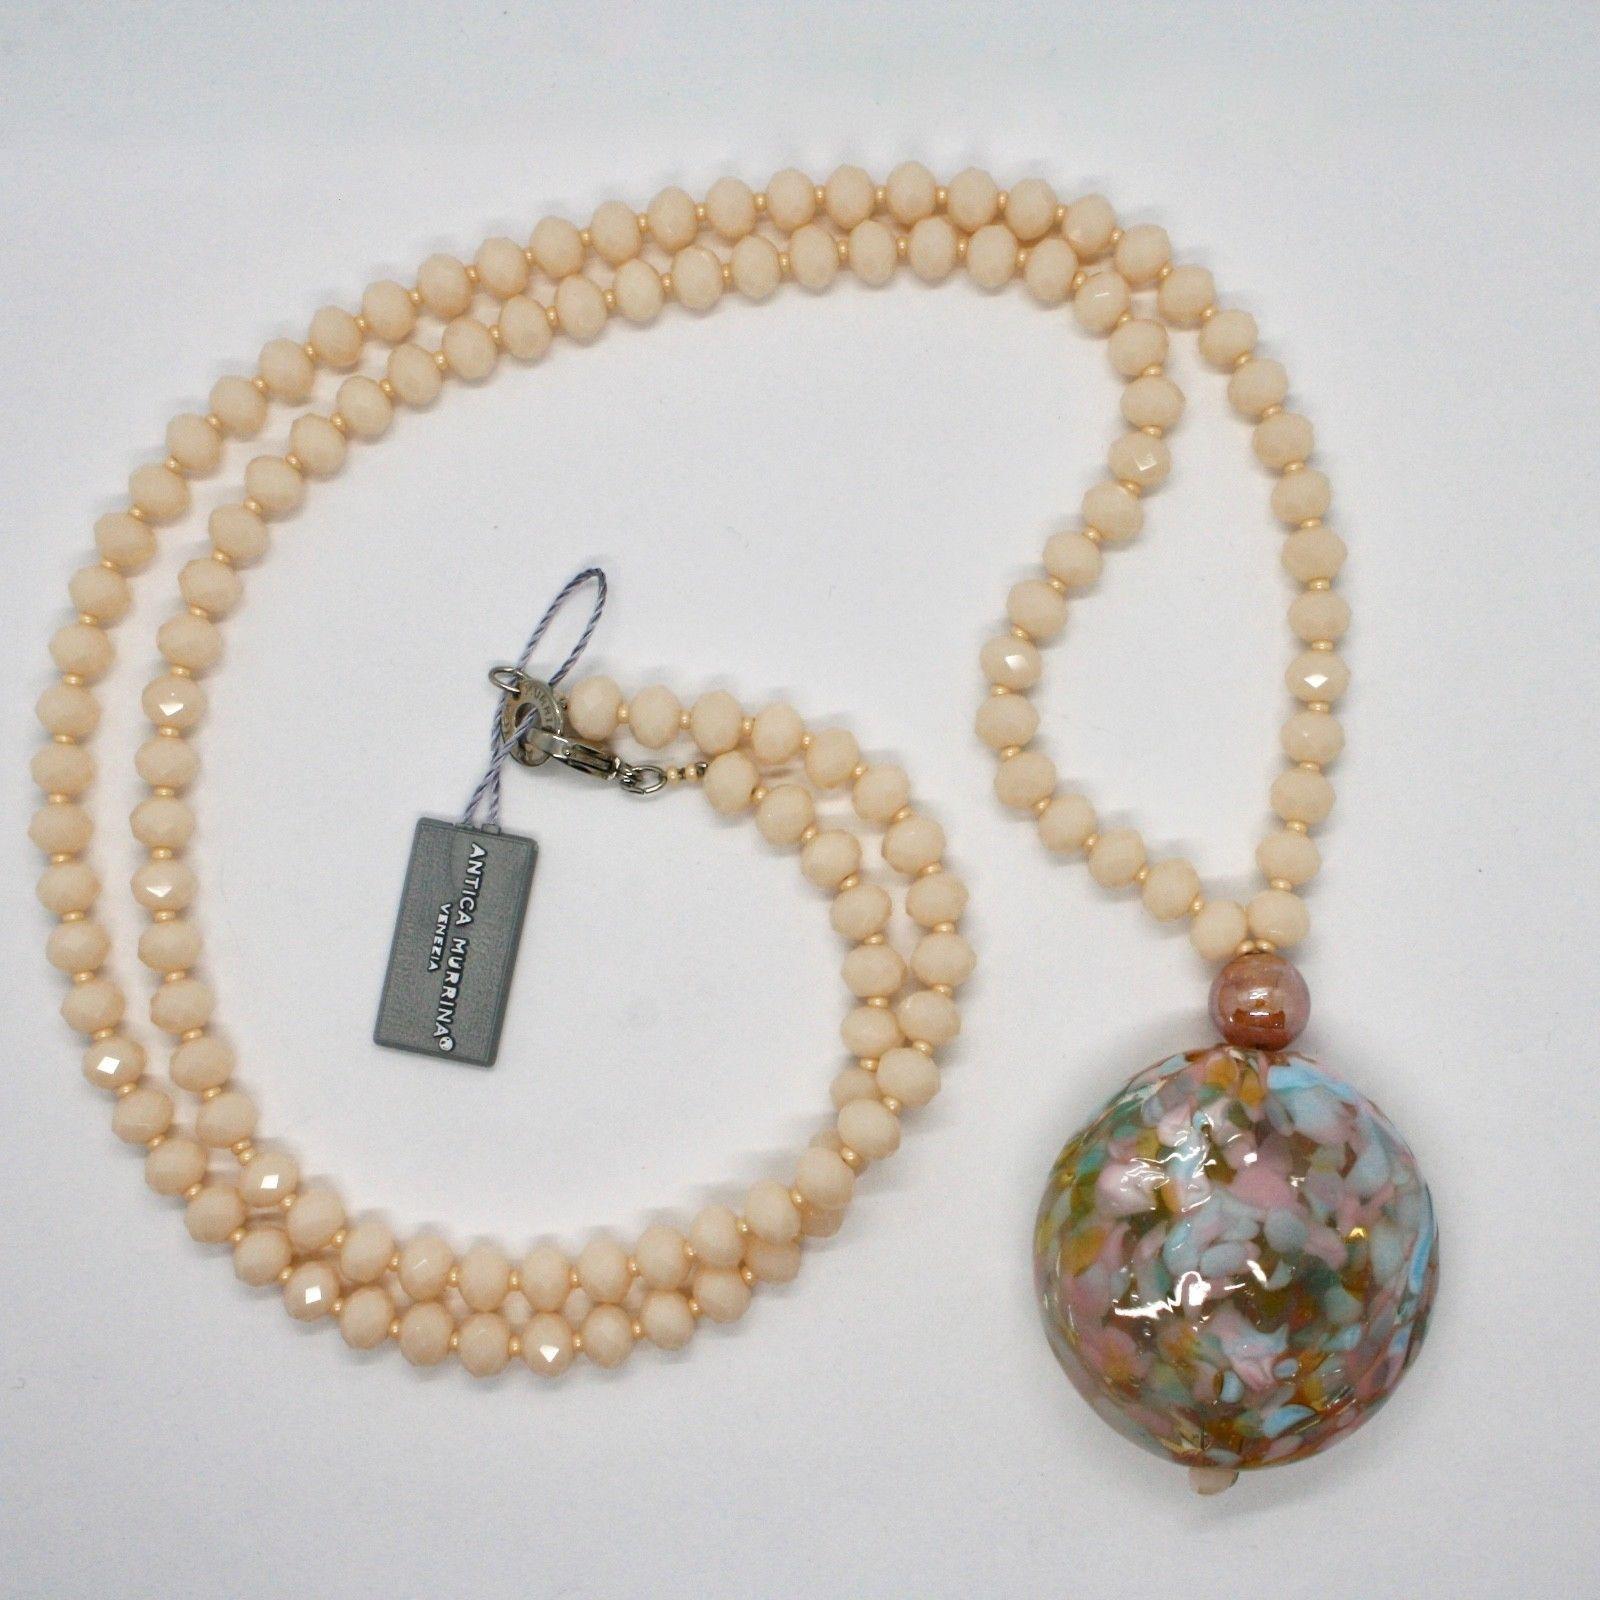 NECKLACE ANTICA MURRINA VENEZIA WITH MURANO GLASS CREAM PINK BEIGE COA76A03